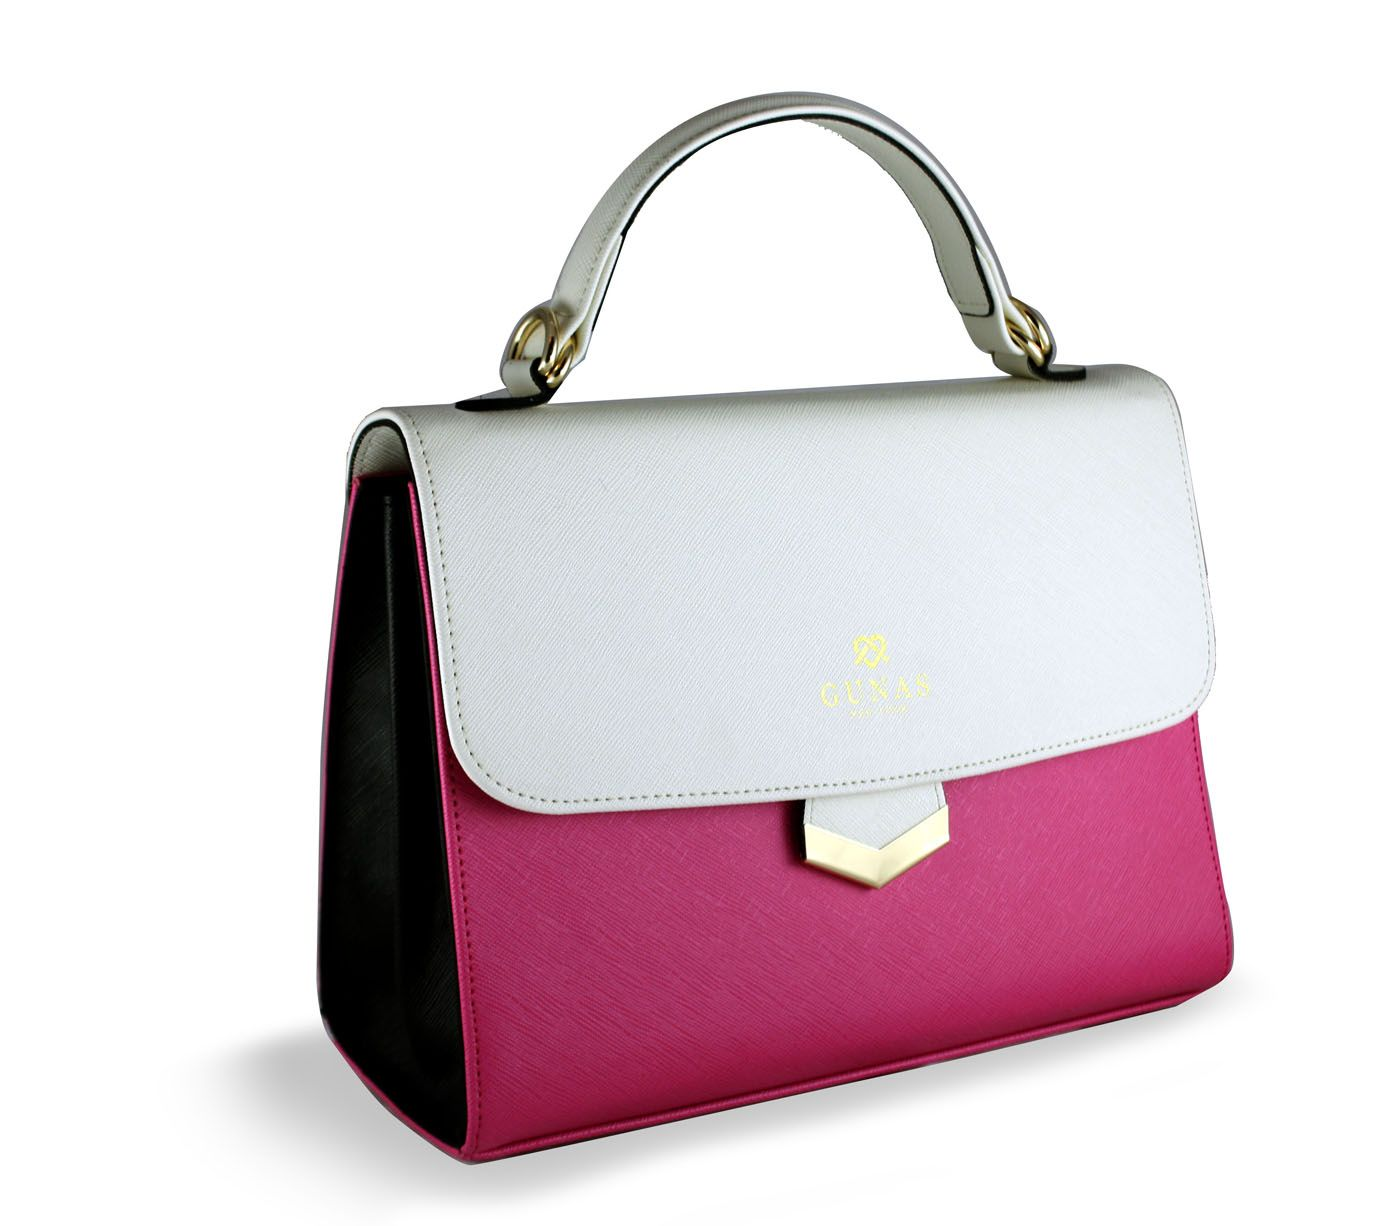 Vegan Leather Handbag By Gunas High Fashion Zero Cruelty Brand That Produces Amazing Luxury